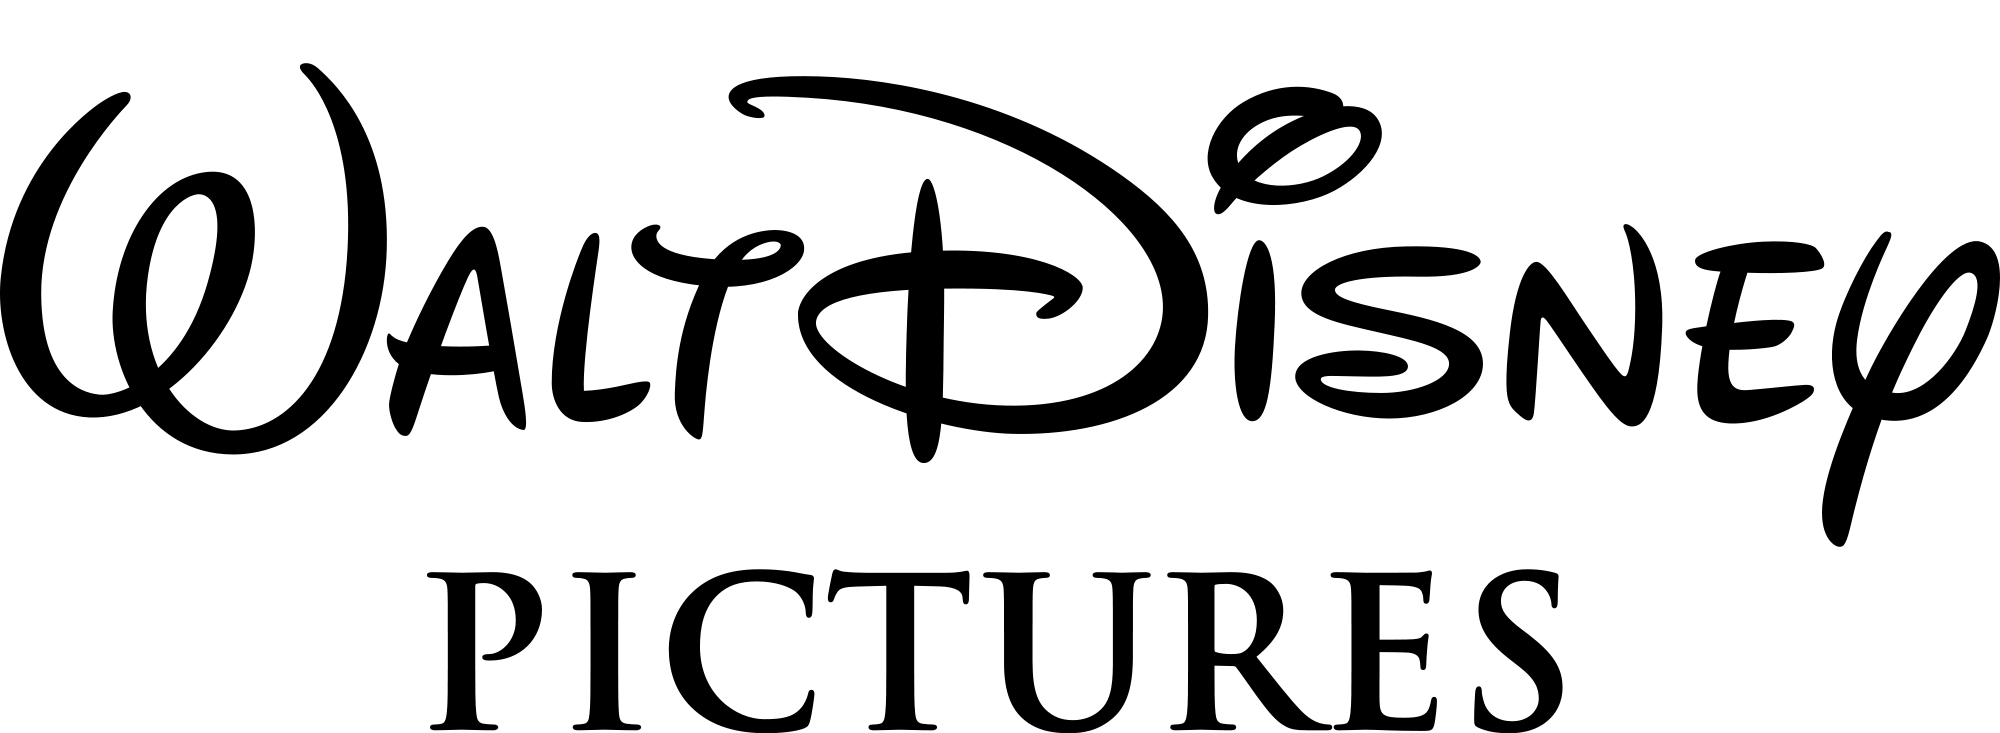 signature walt disney 2